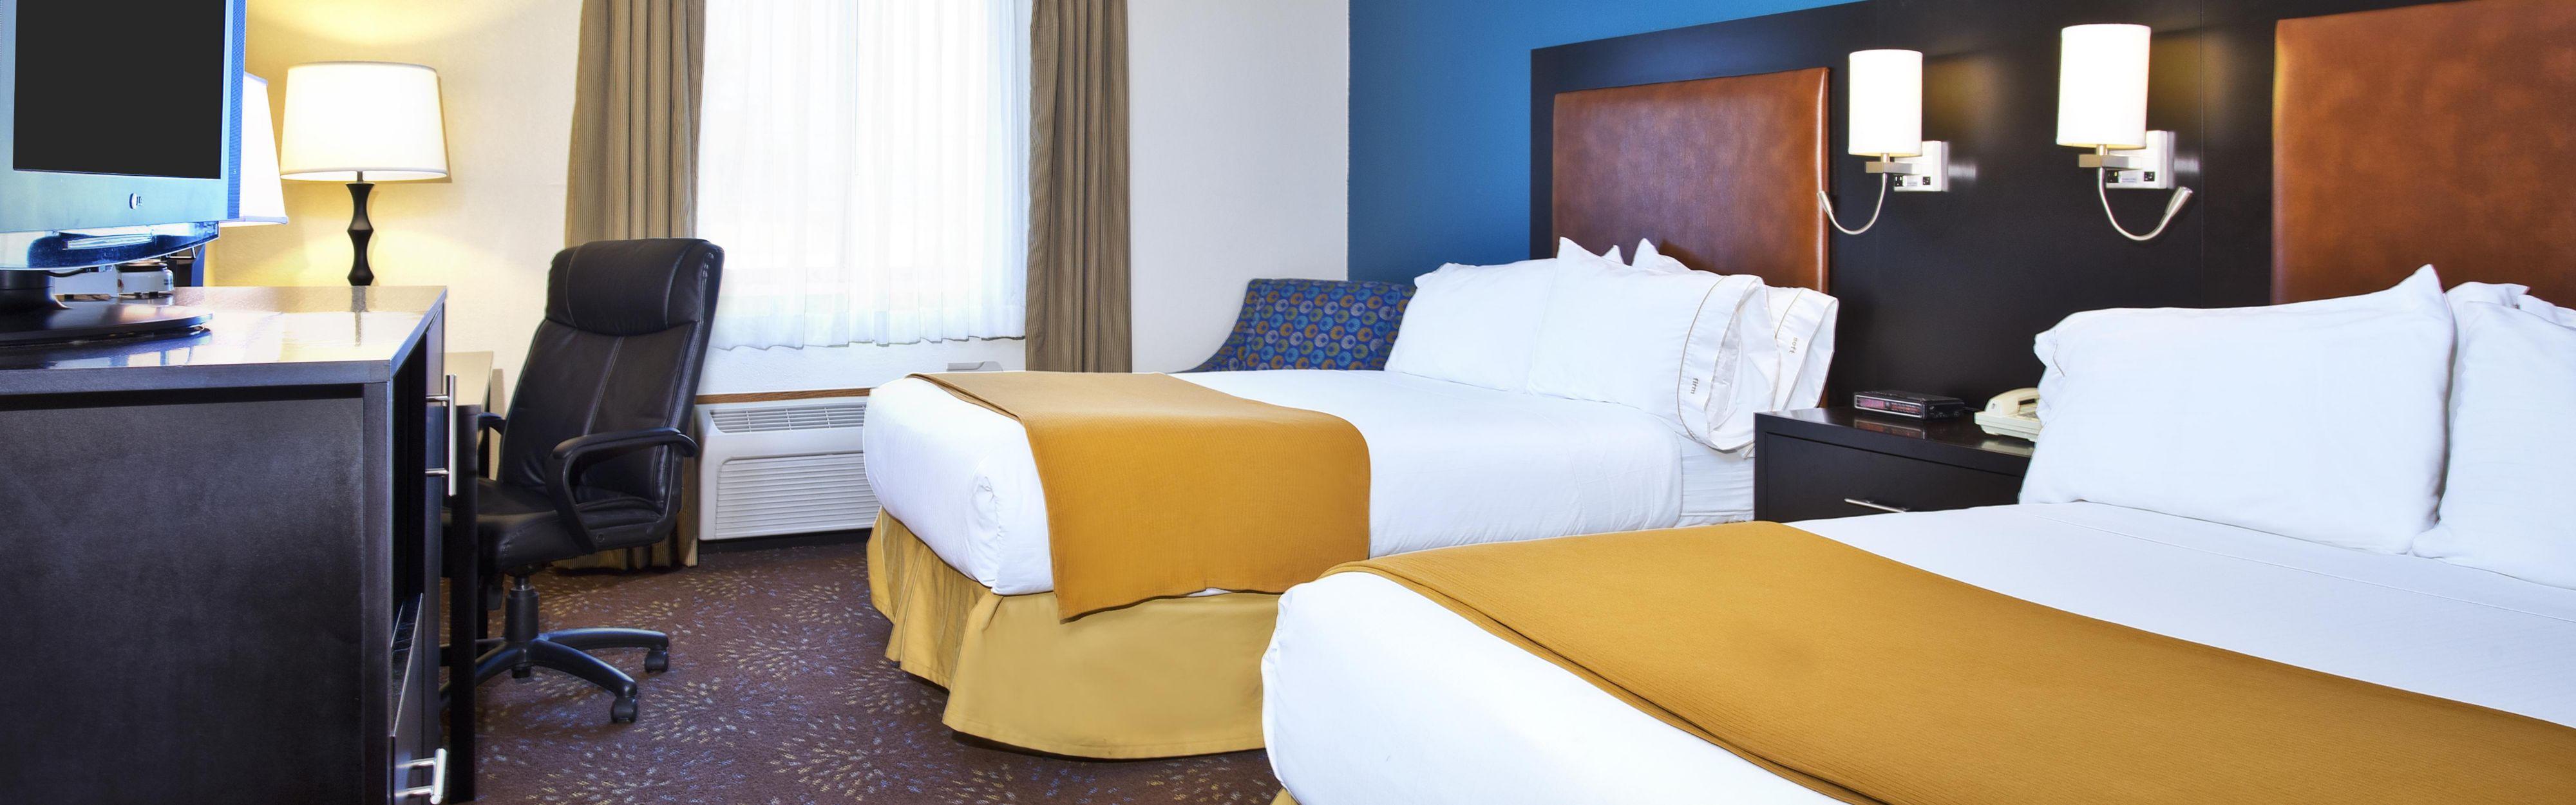 Holiday Inn Express Mackinaw City image 1